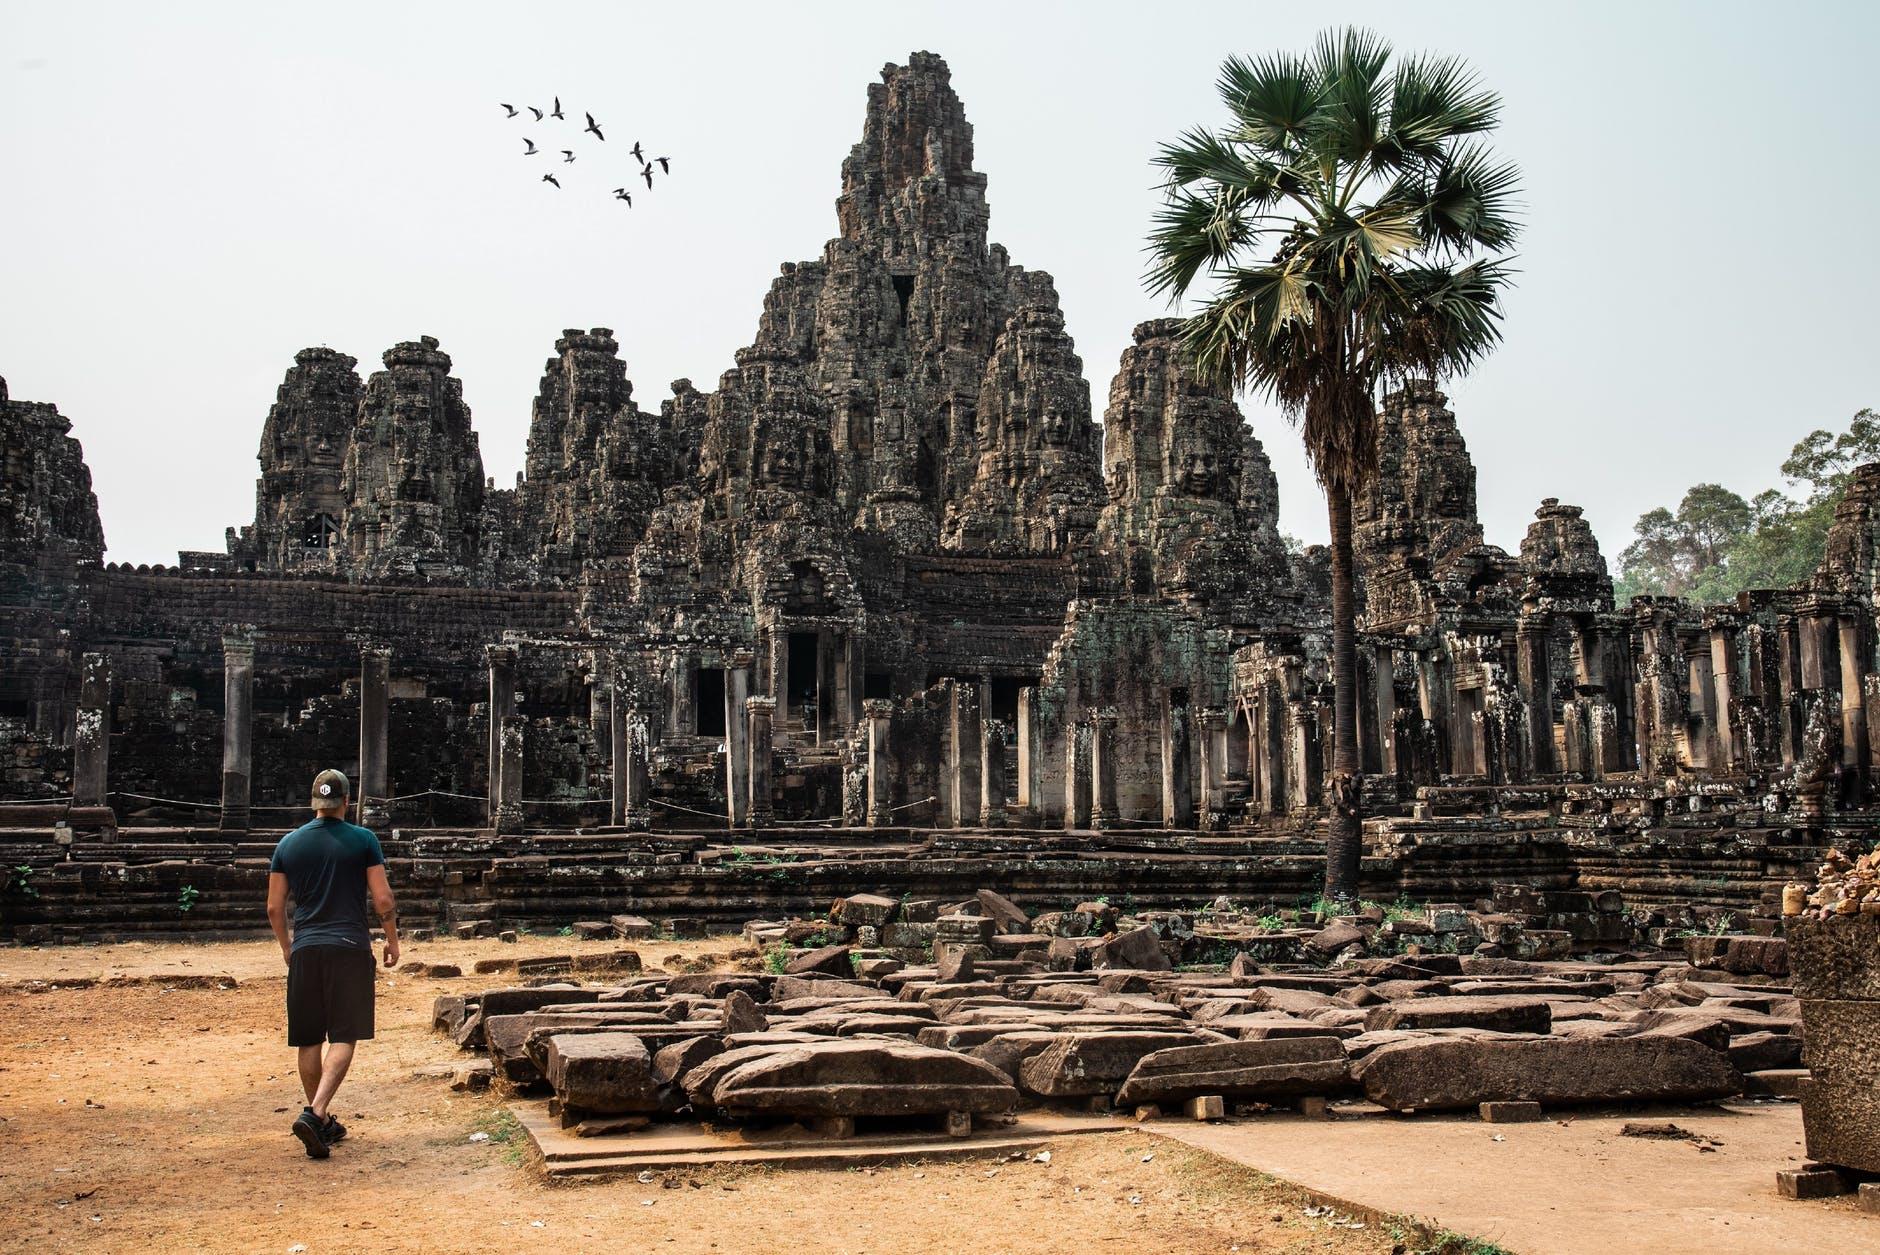 usi di garcinia cambogia